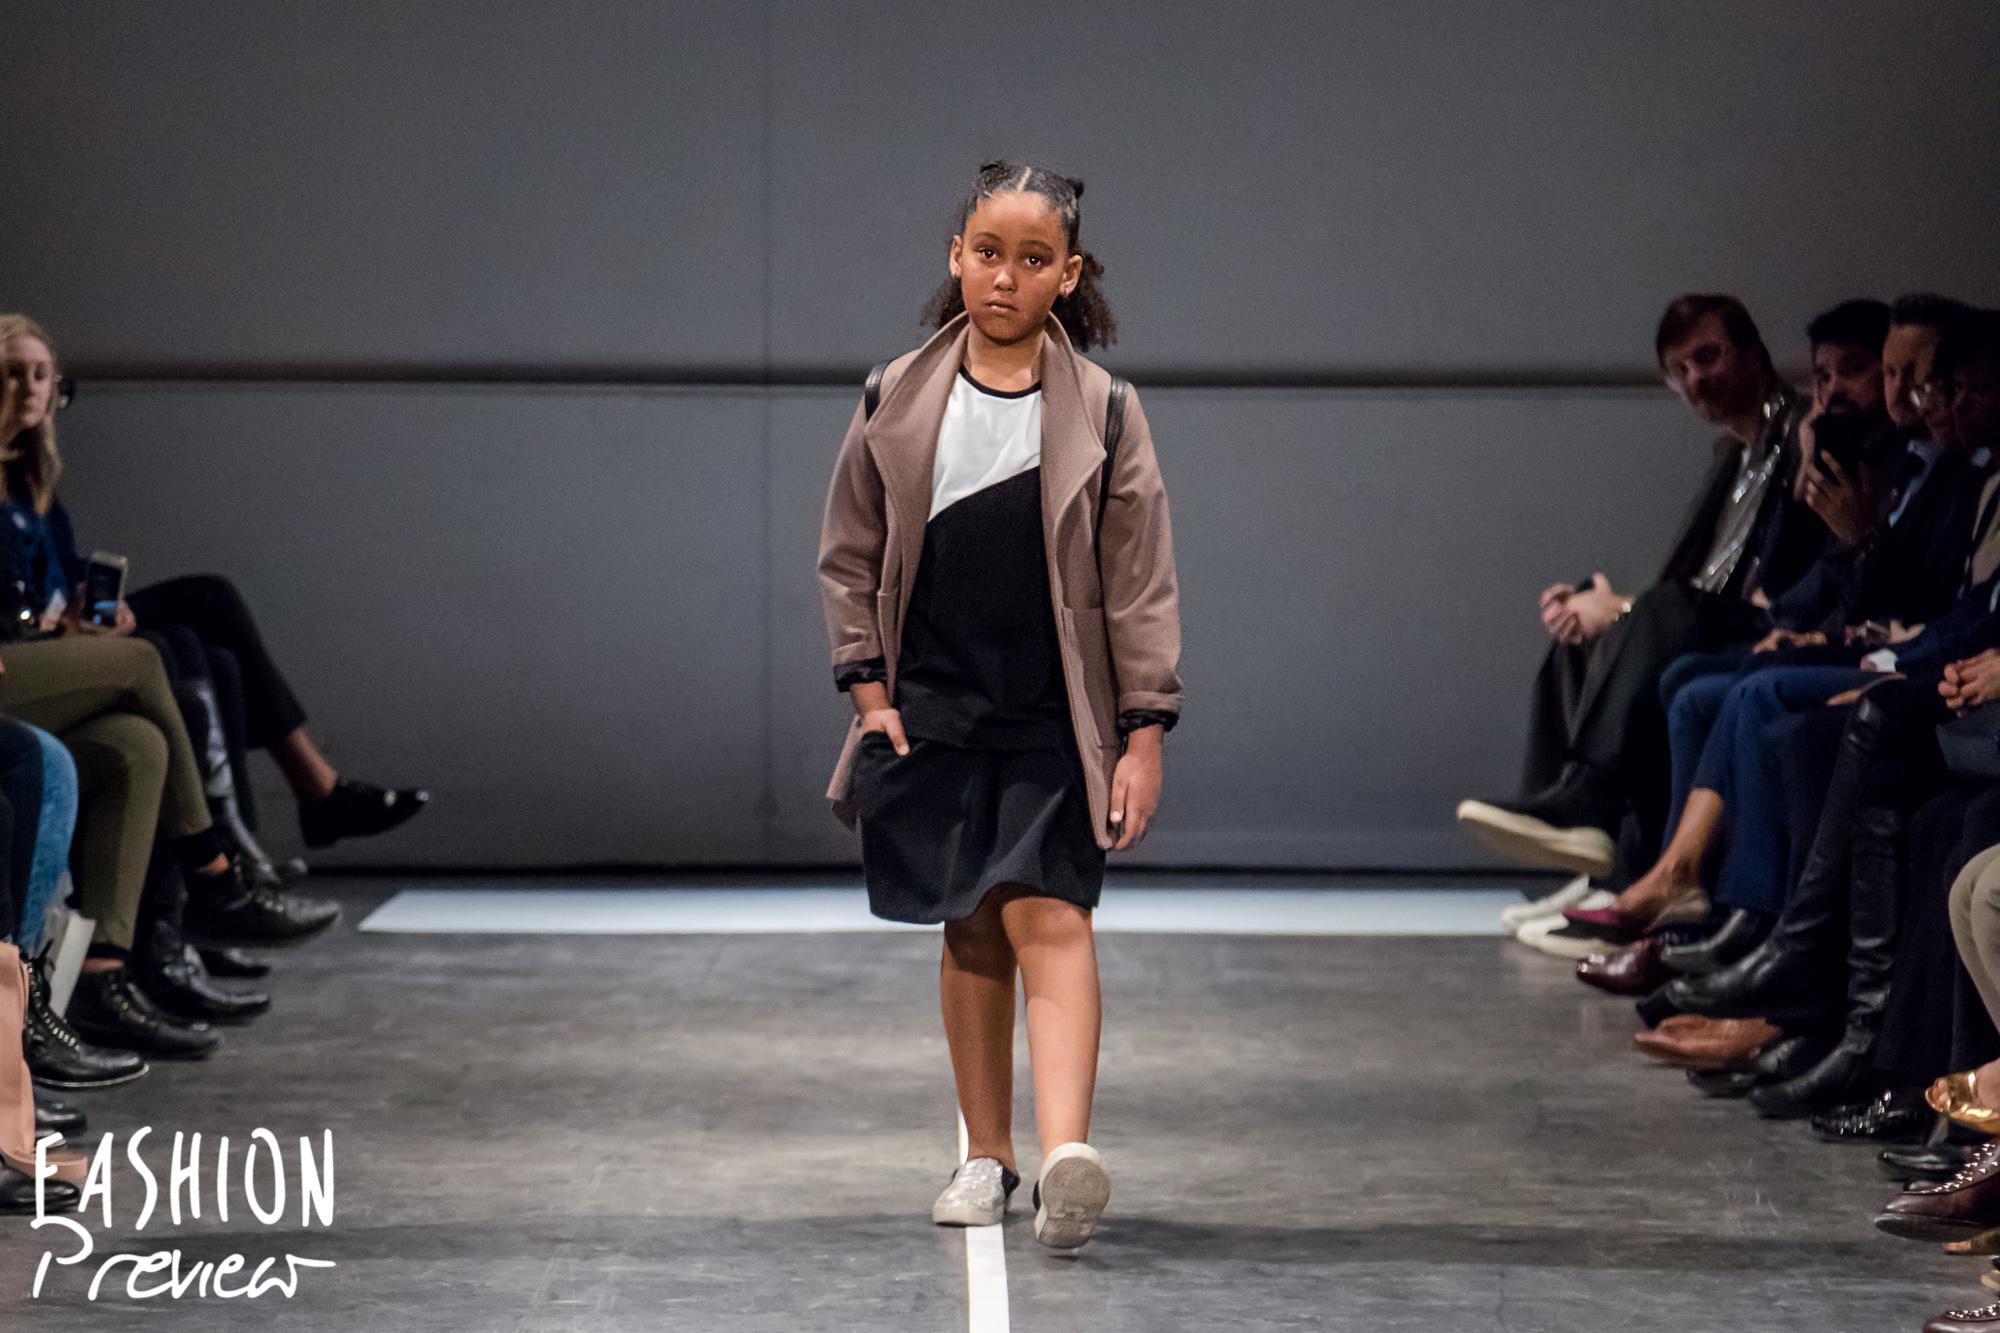 Fashion Preview 9 - Naike-14.jpg